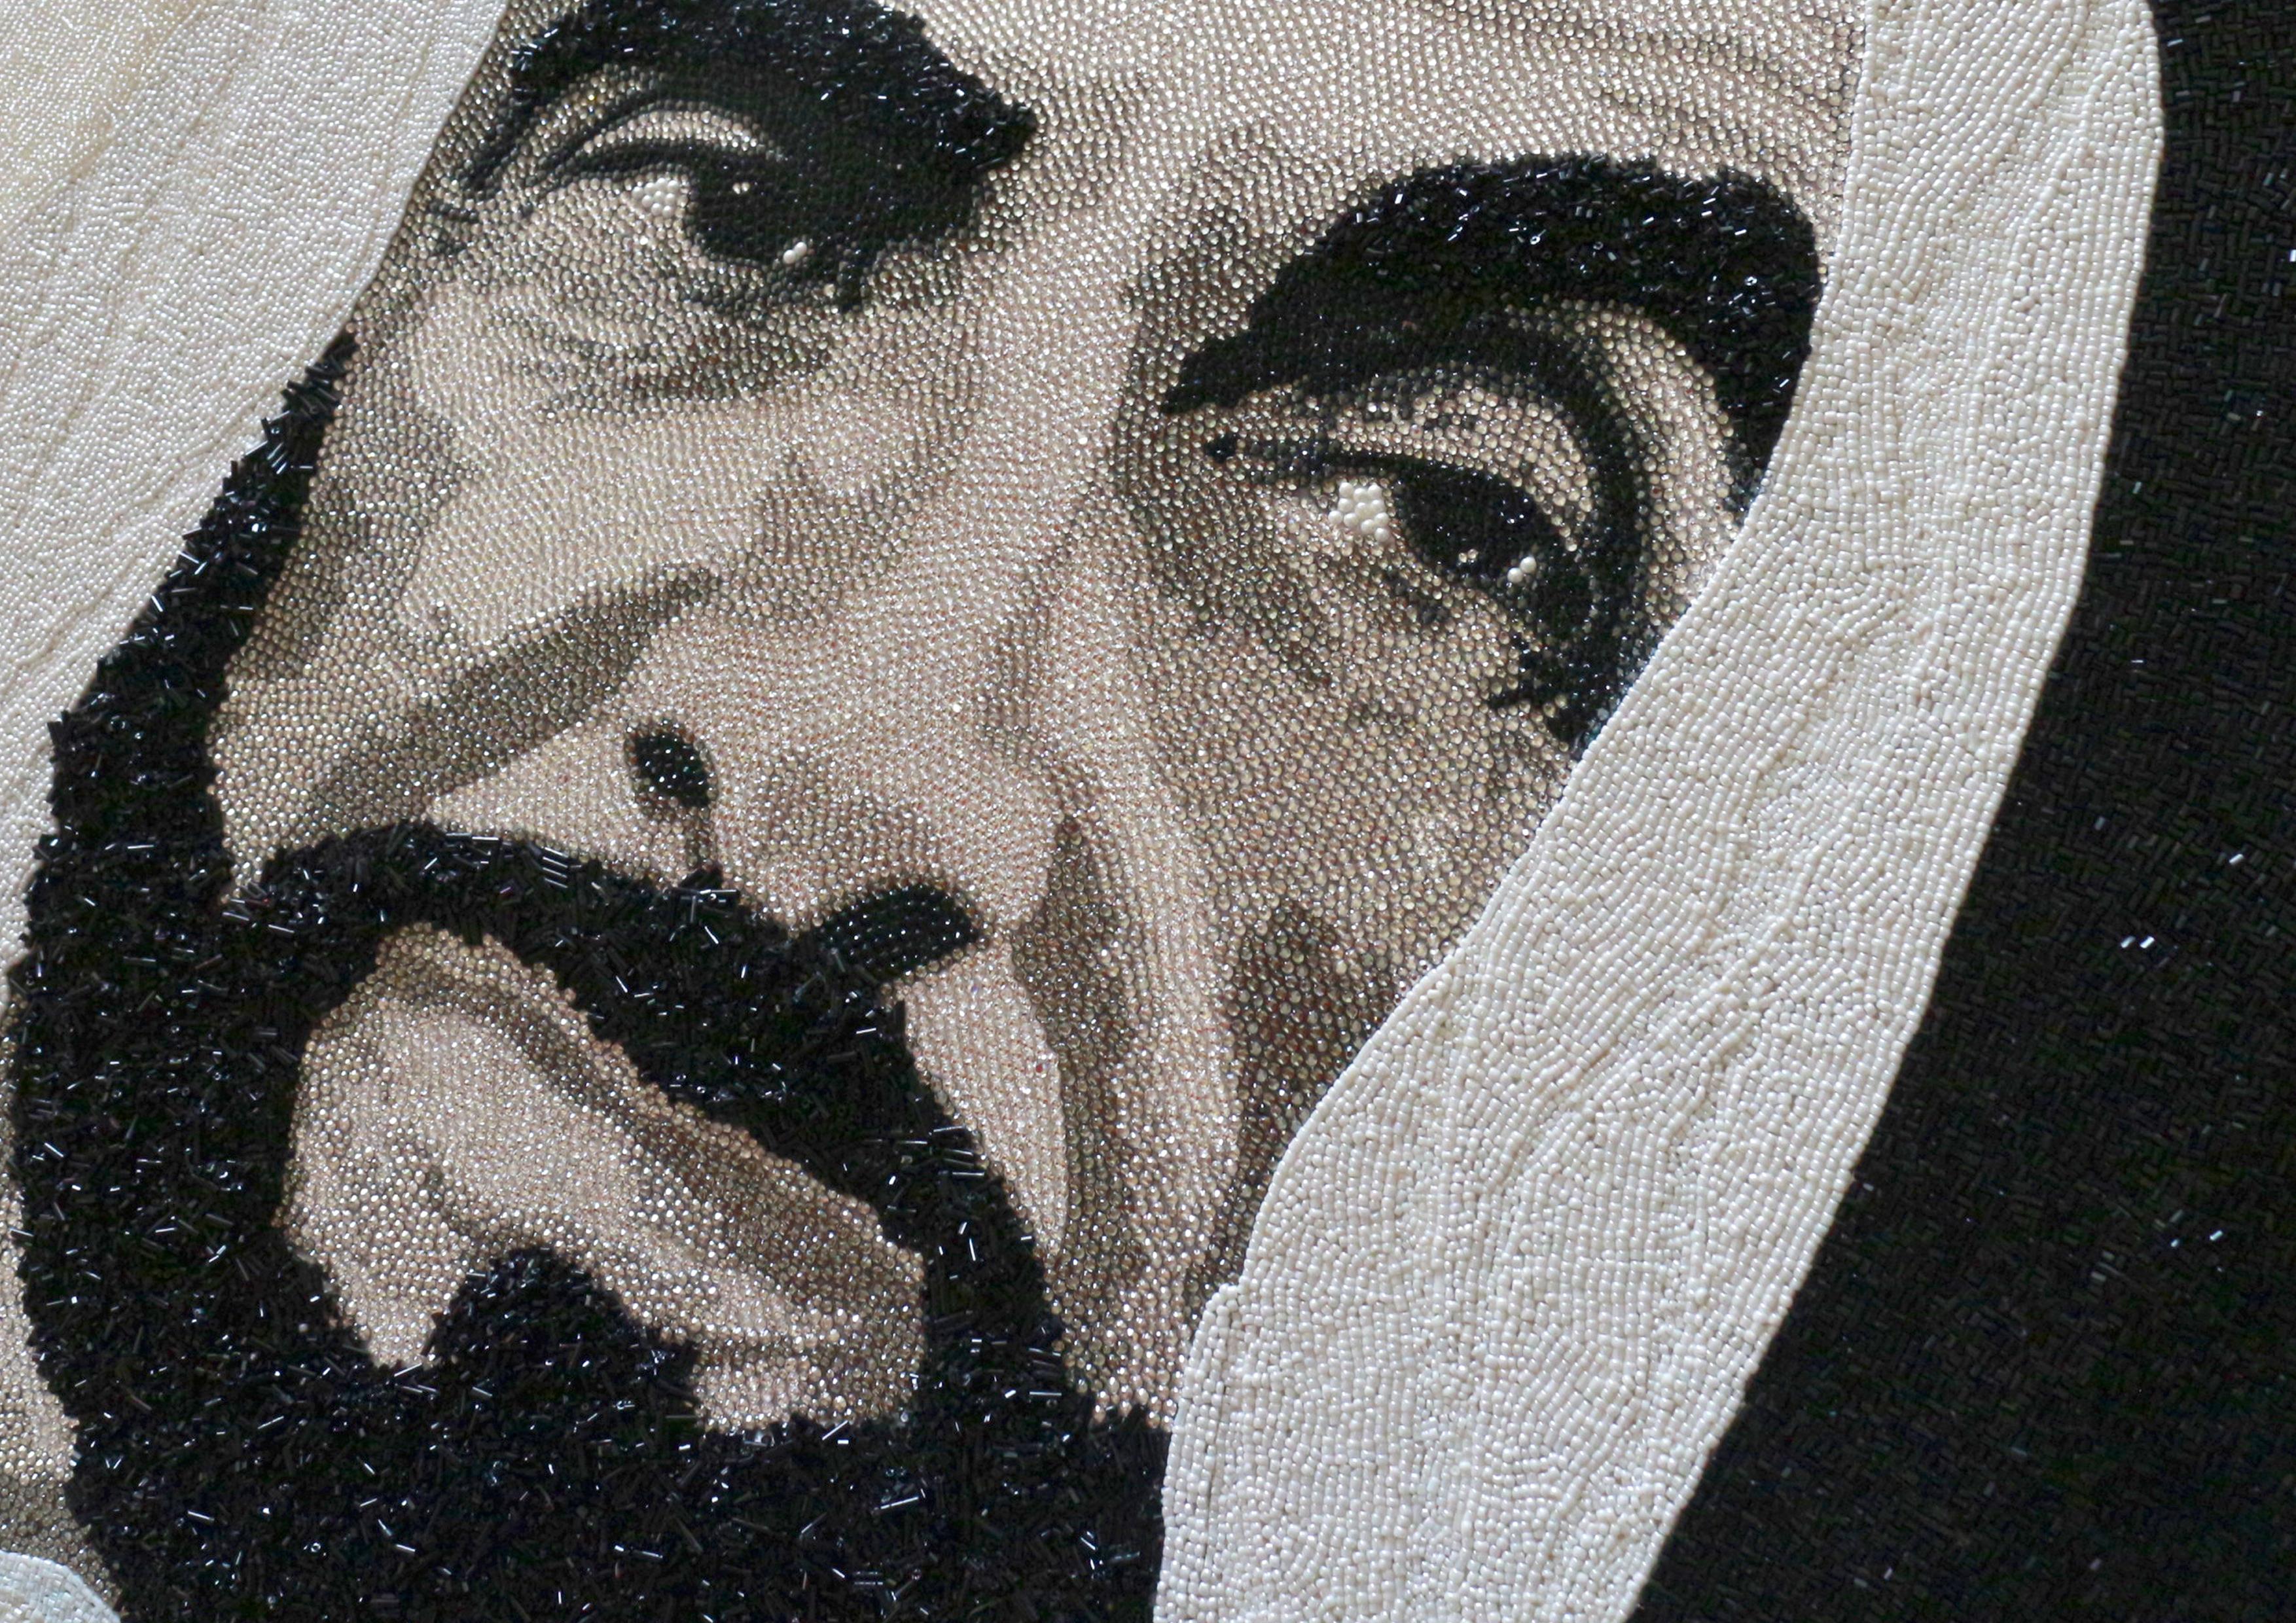 HH Sheikh Zayed Abu Dhabi Natalie Daghestani Swarovski Art2